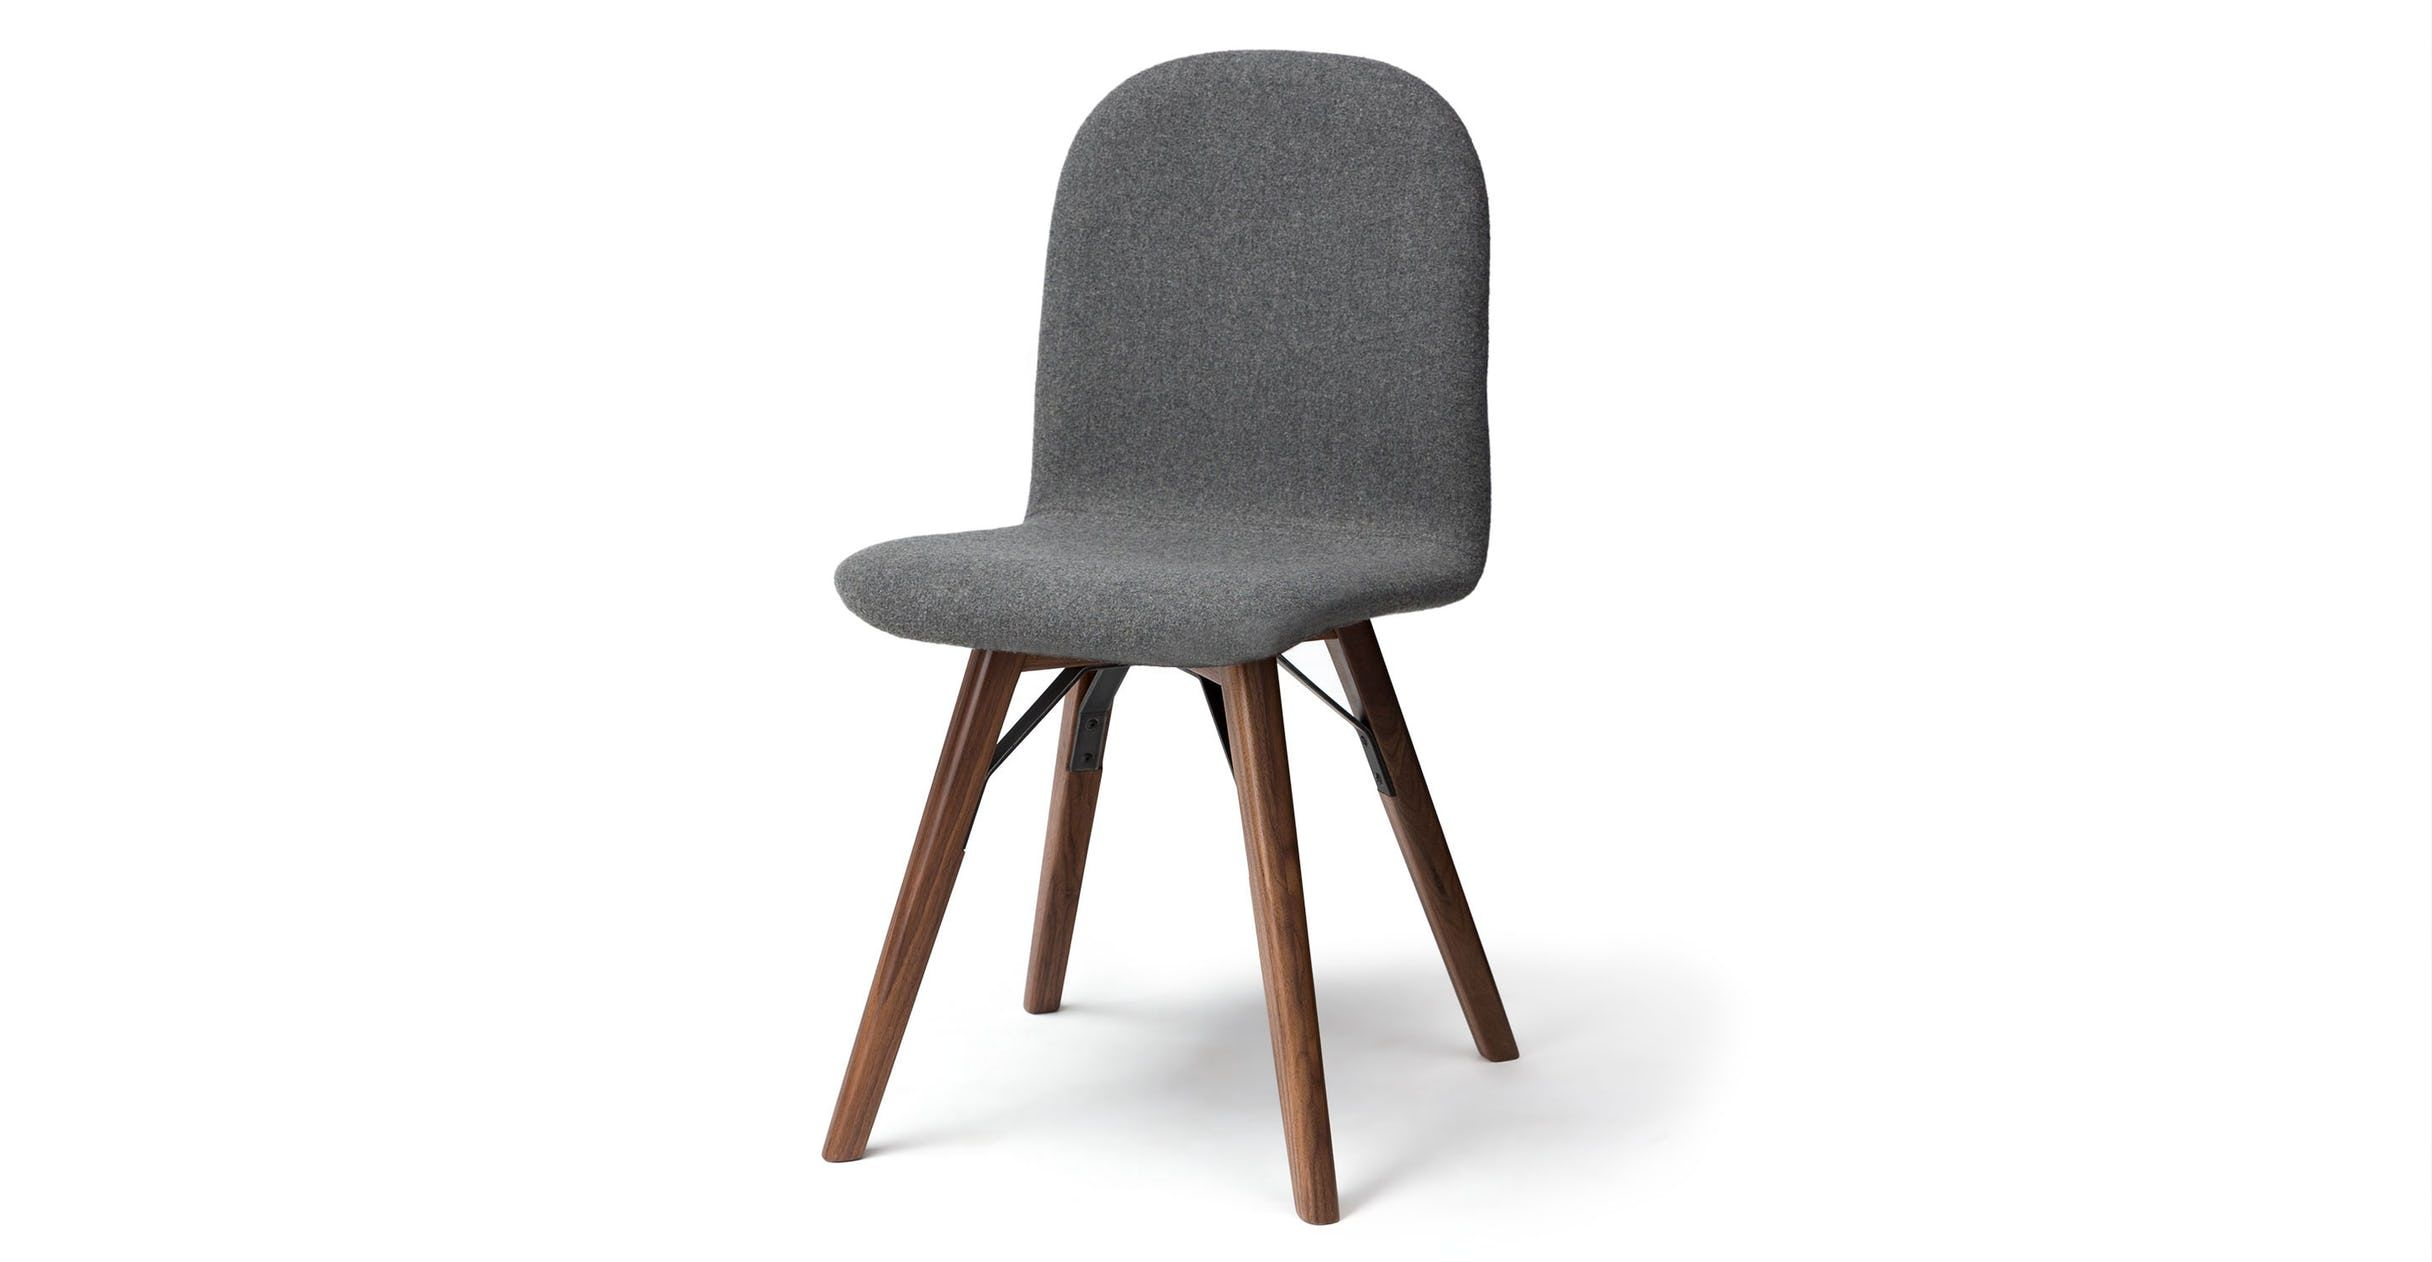 Outstanding 2 X Gray Dining Chair In Walnut Wood Article Mecana Modern Machost Co Dining Chair Design Ideas Machostcouk